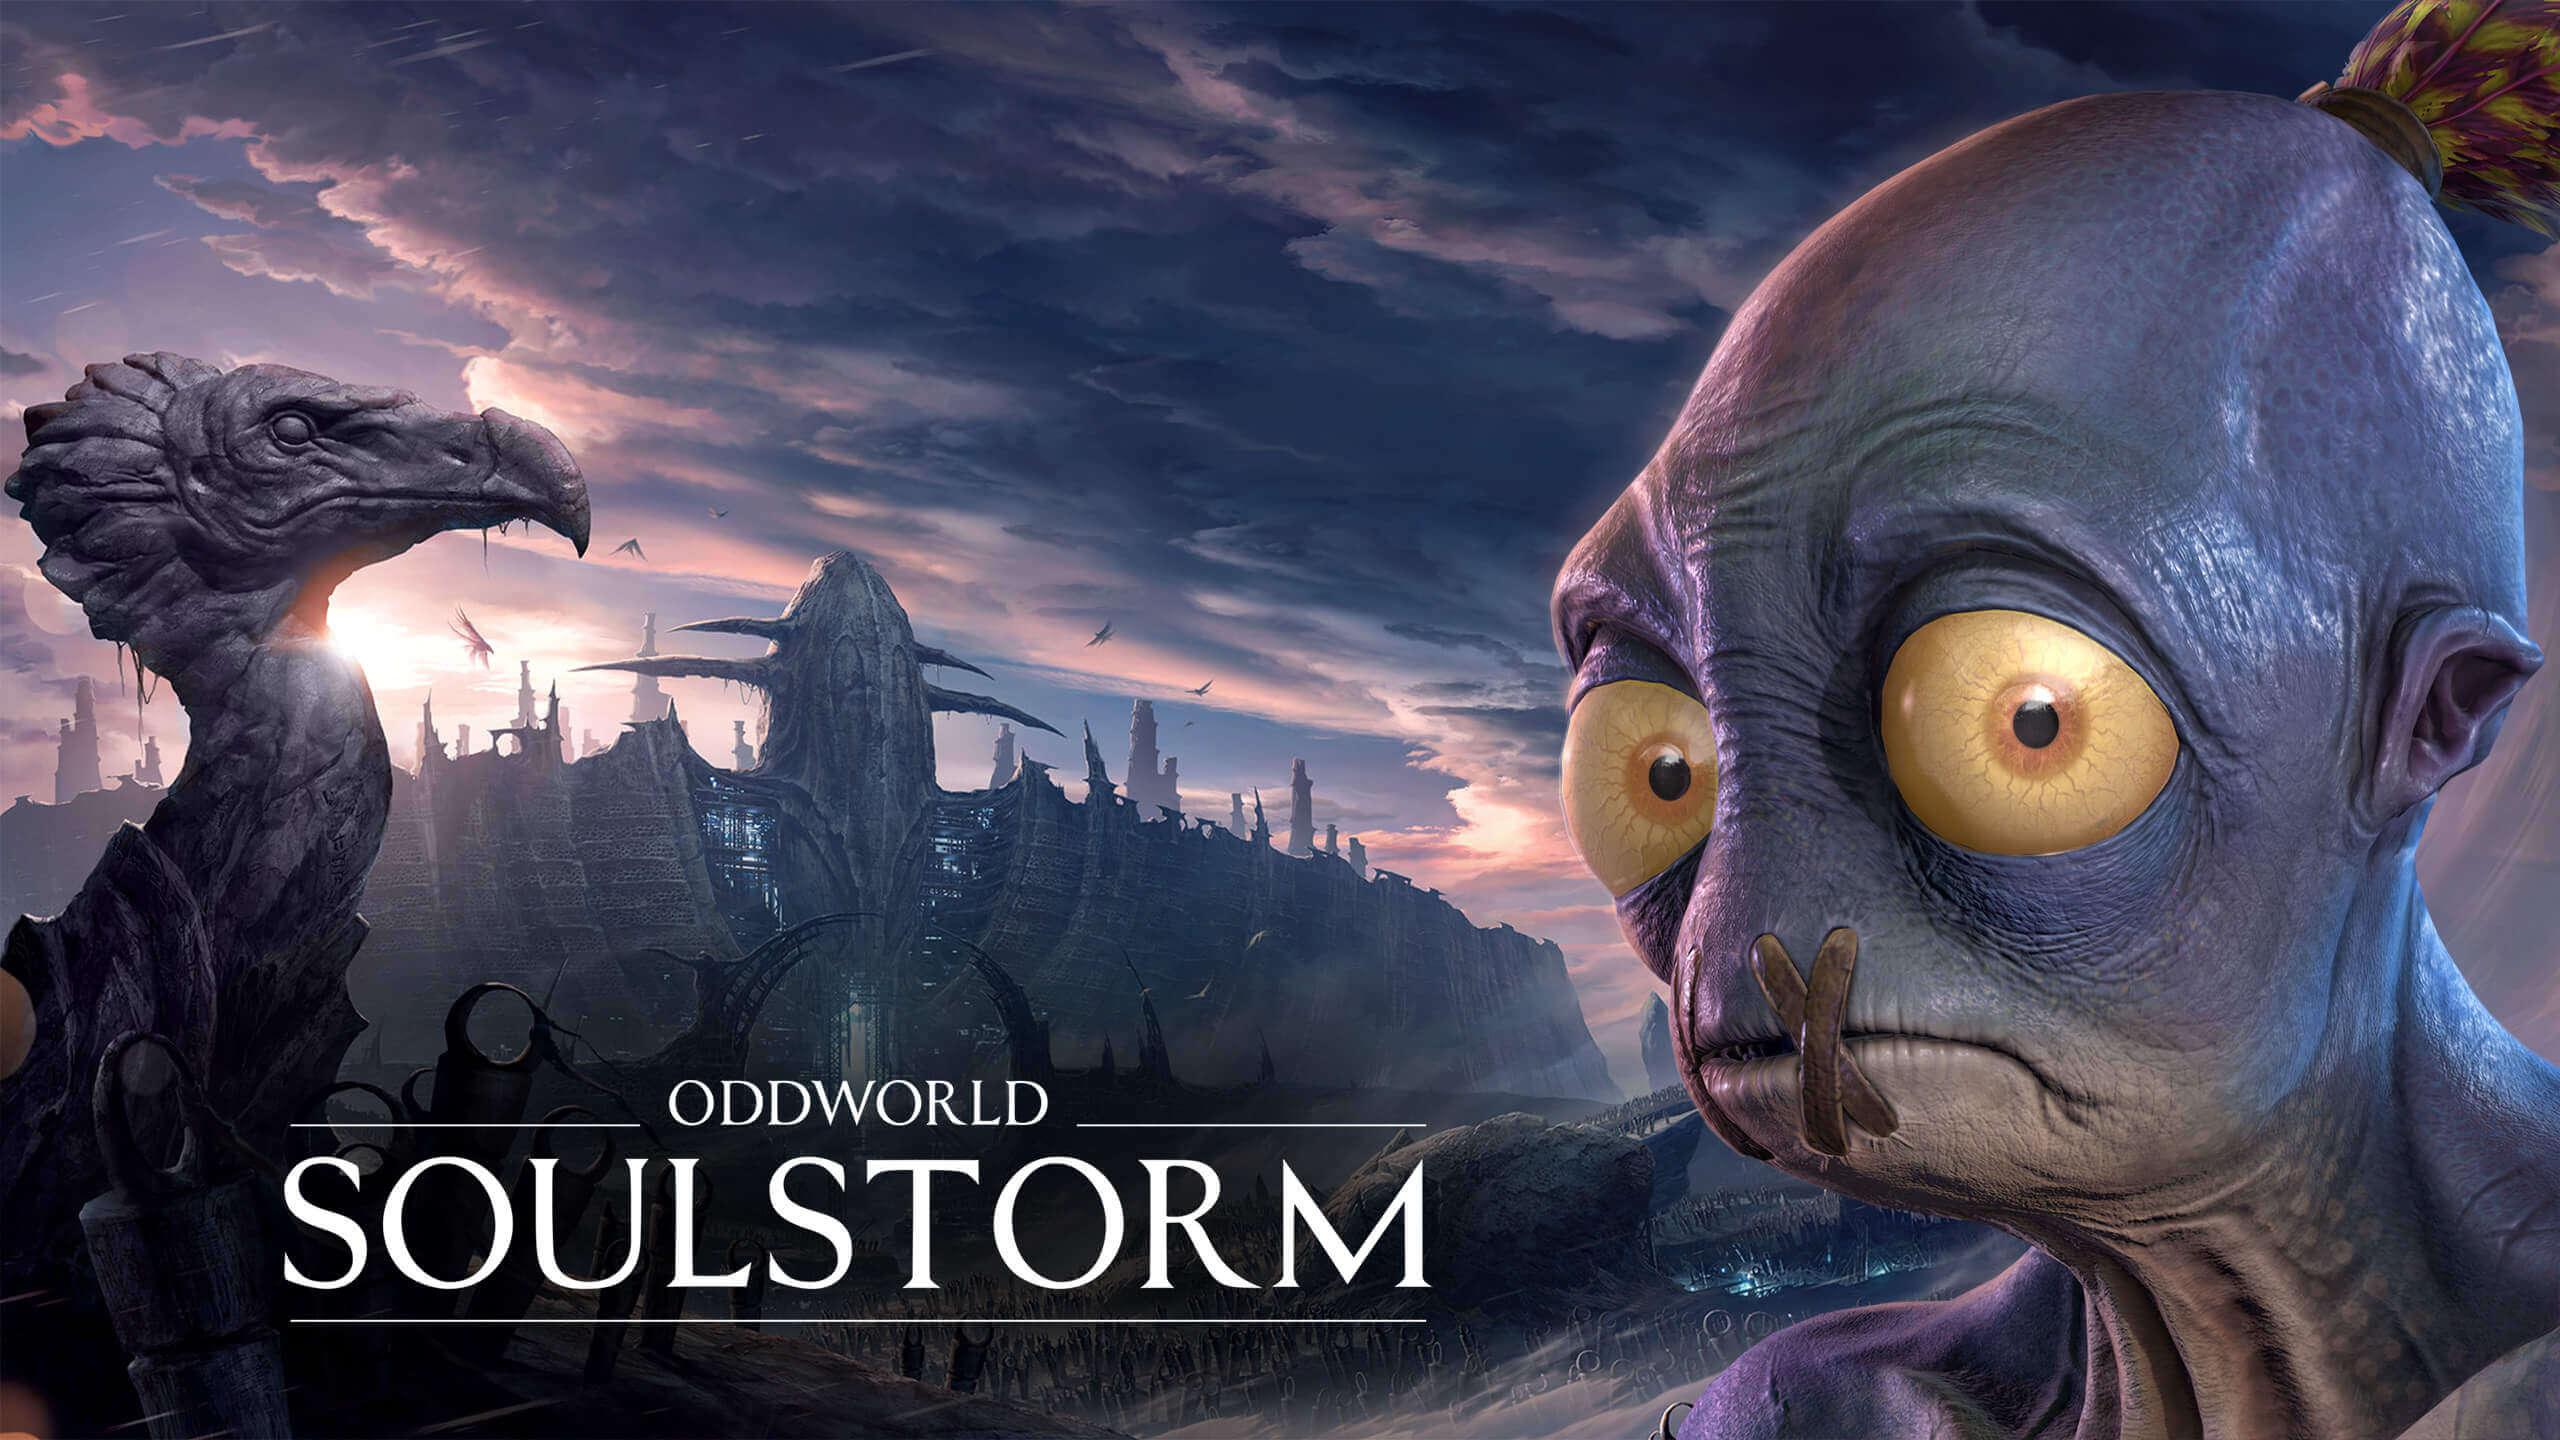 Oddworld S1